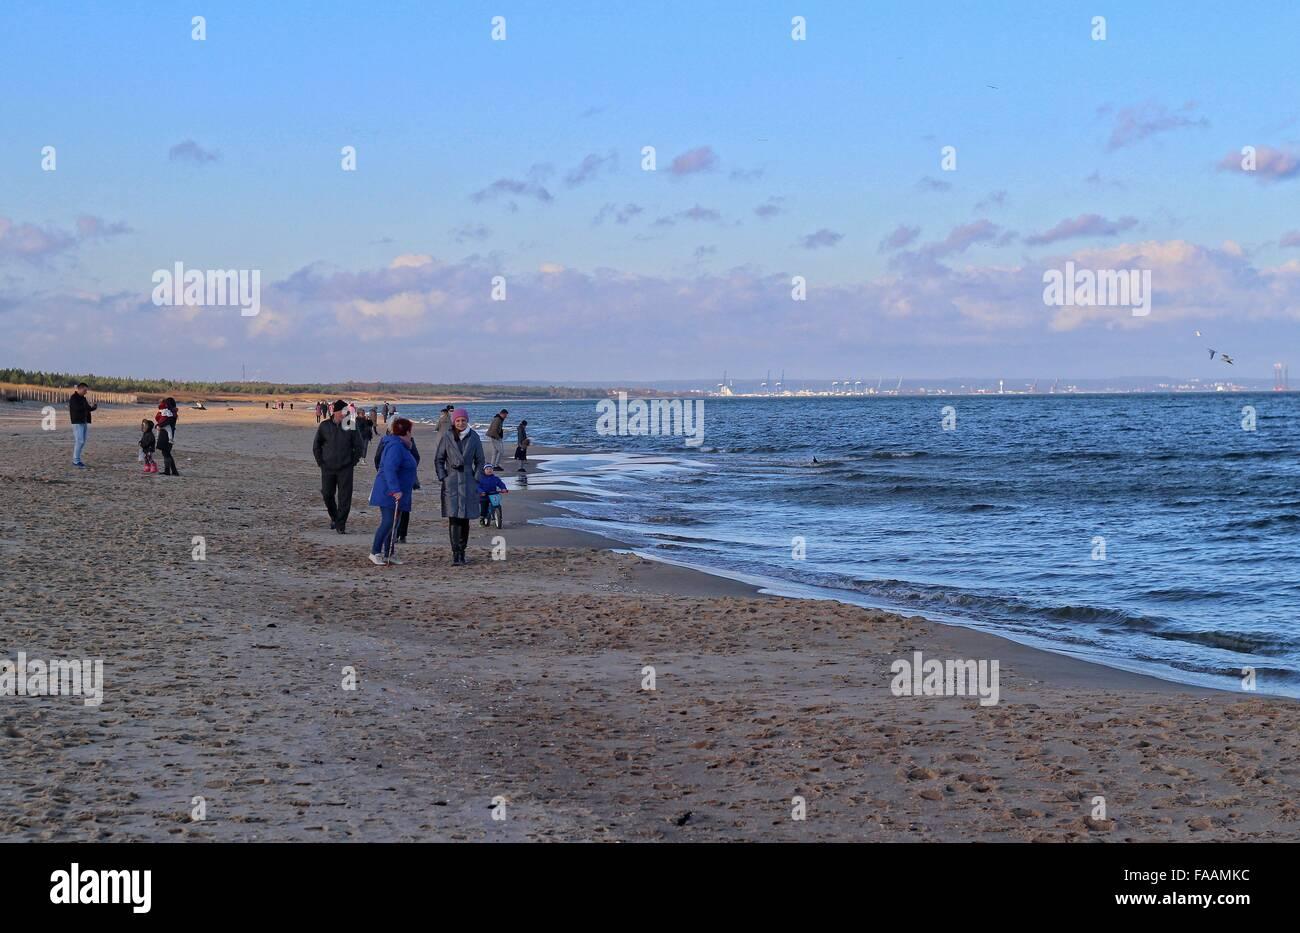 Gdansk, Poland 25th, Dec. 2015 People enjoy unusually warm December weather walking along the Baltic sea coast on - Stock Image